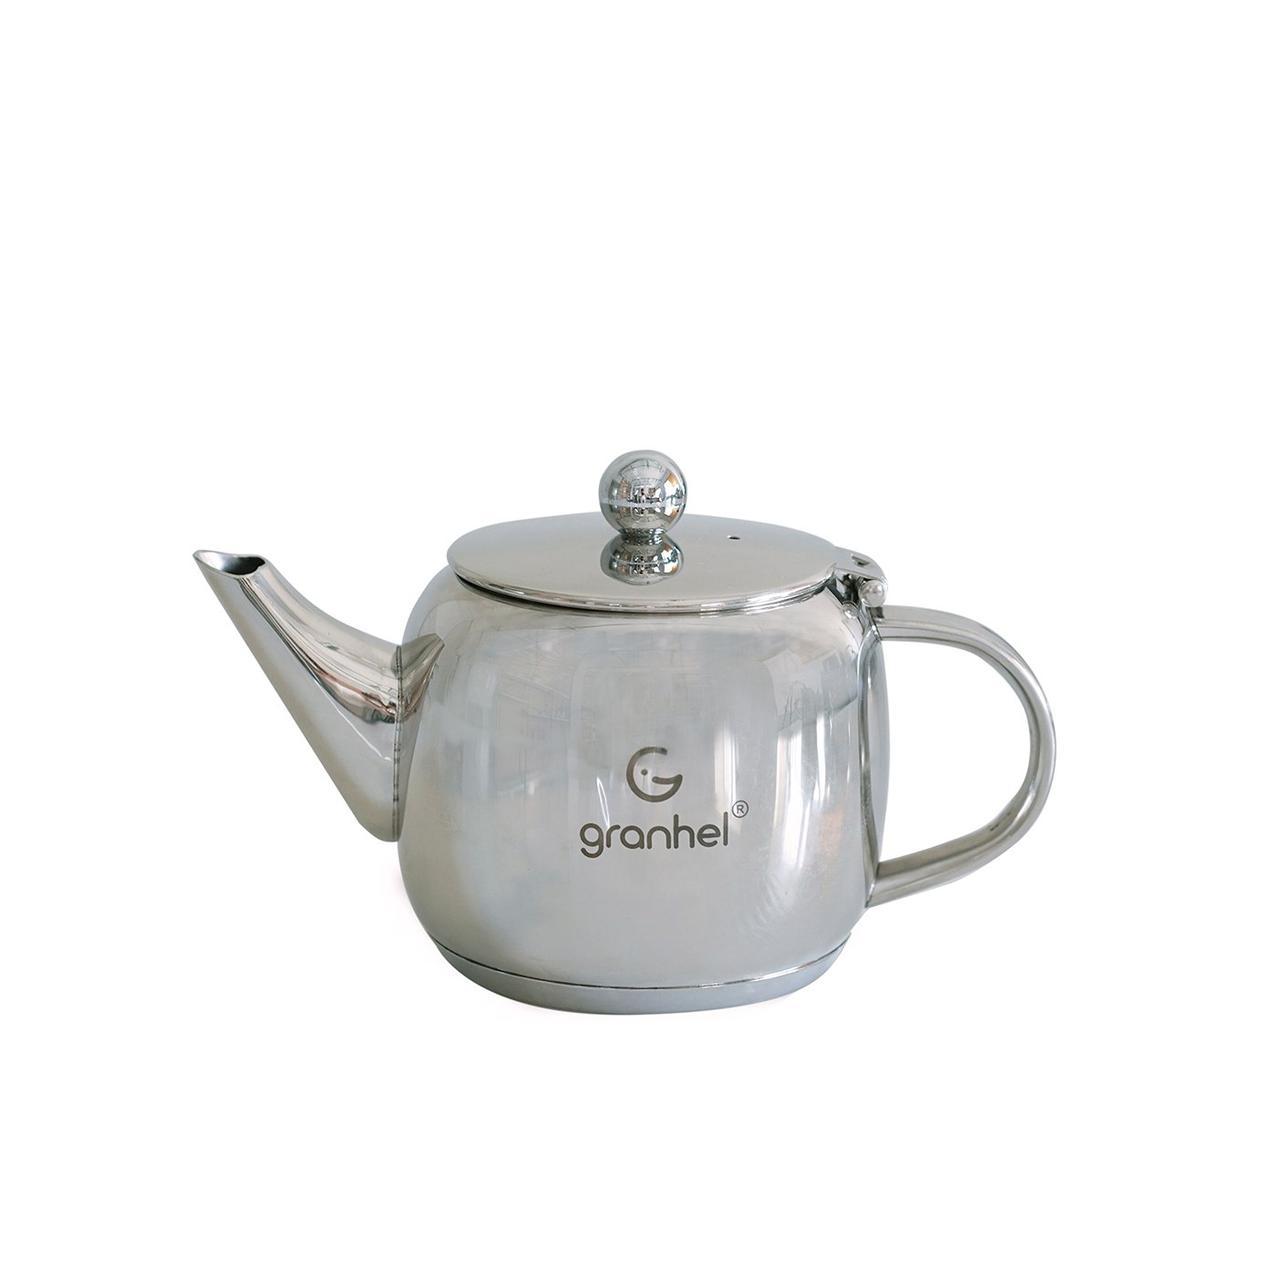 Чайник заварочный granhel Stainless steel 18/10 TS0.6 0,6л